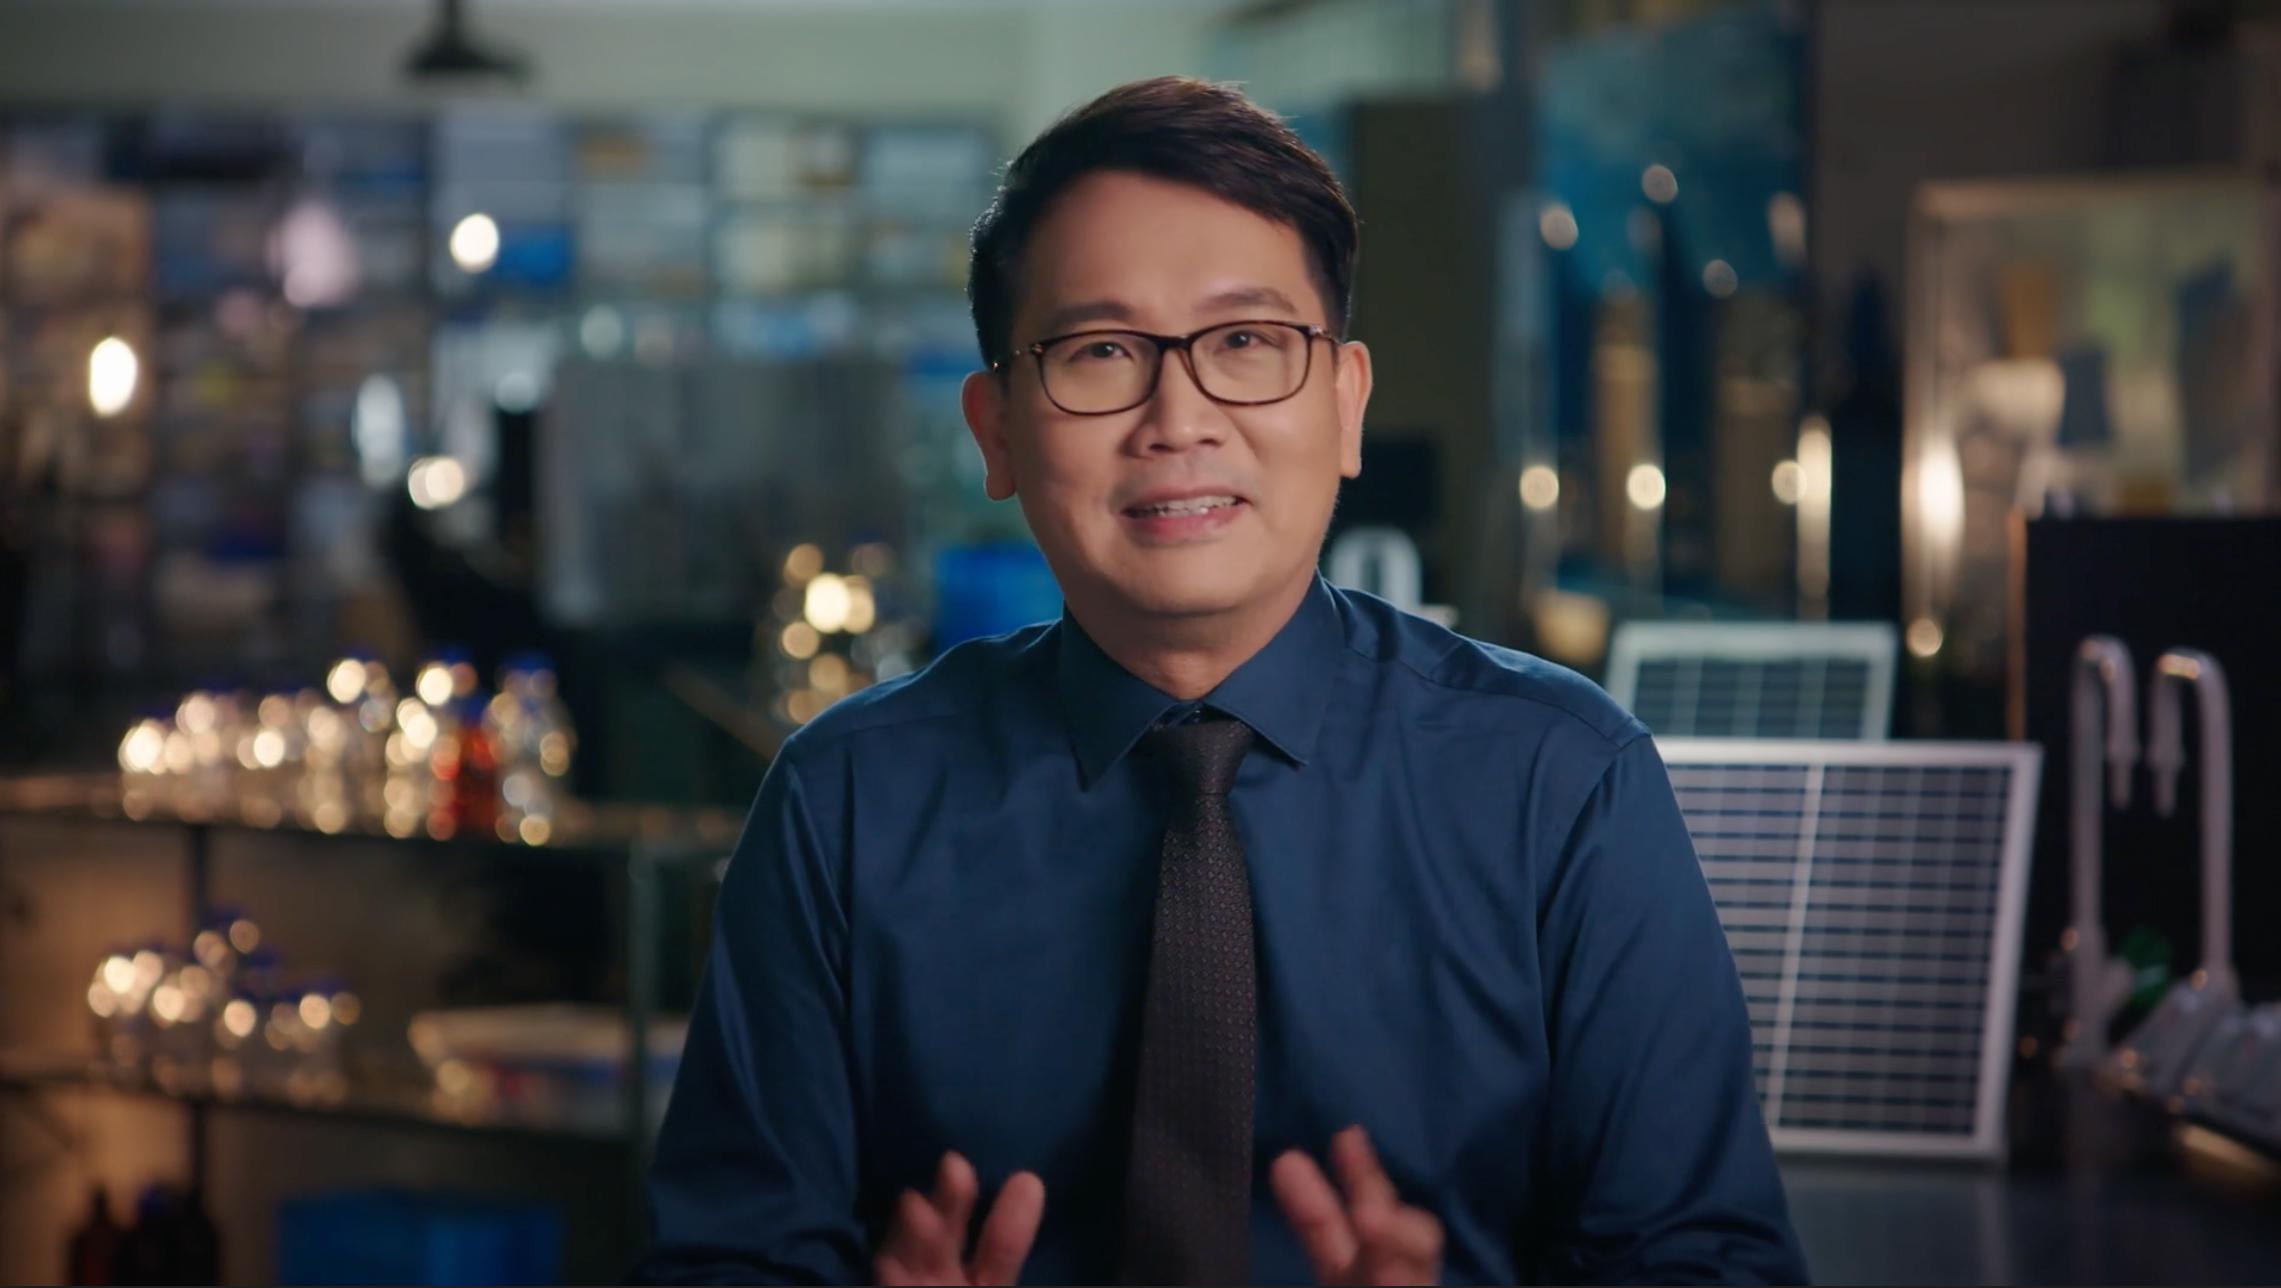 Dr Chang Chew Hung